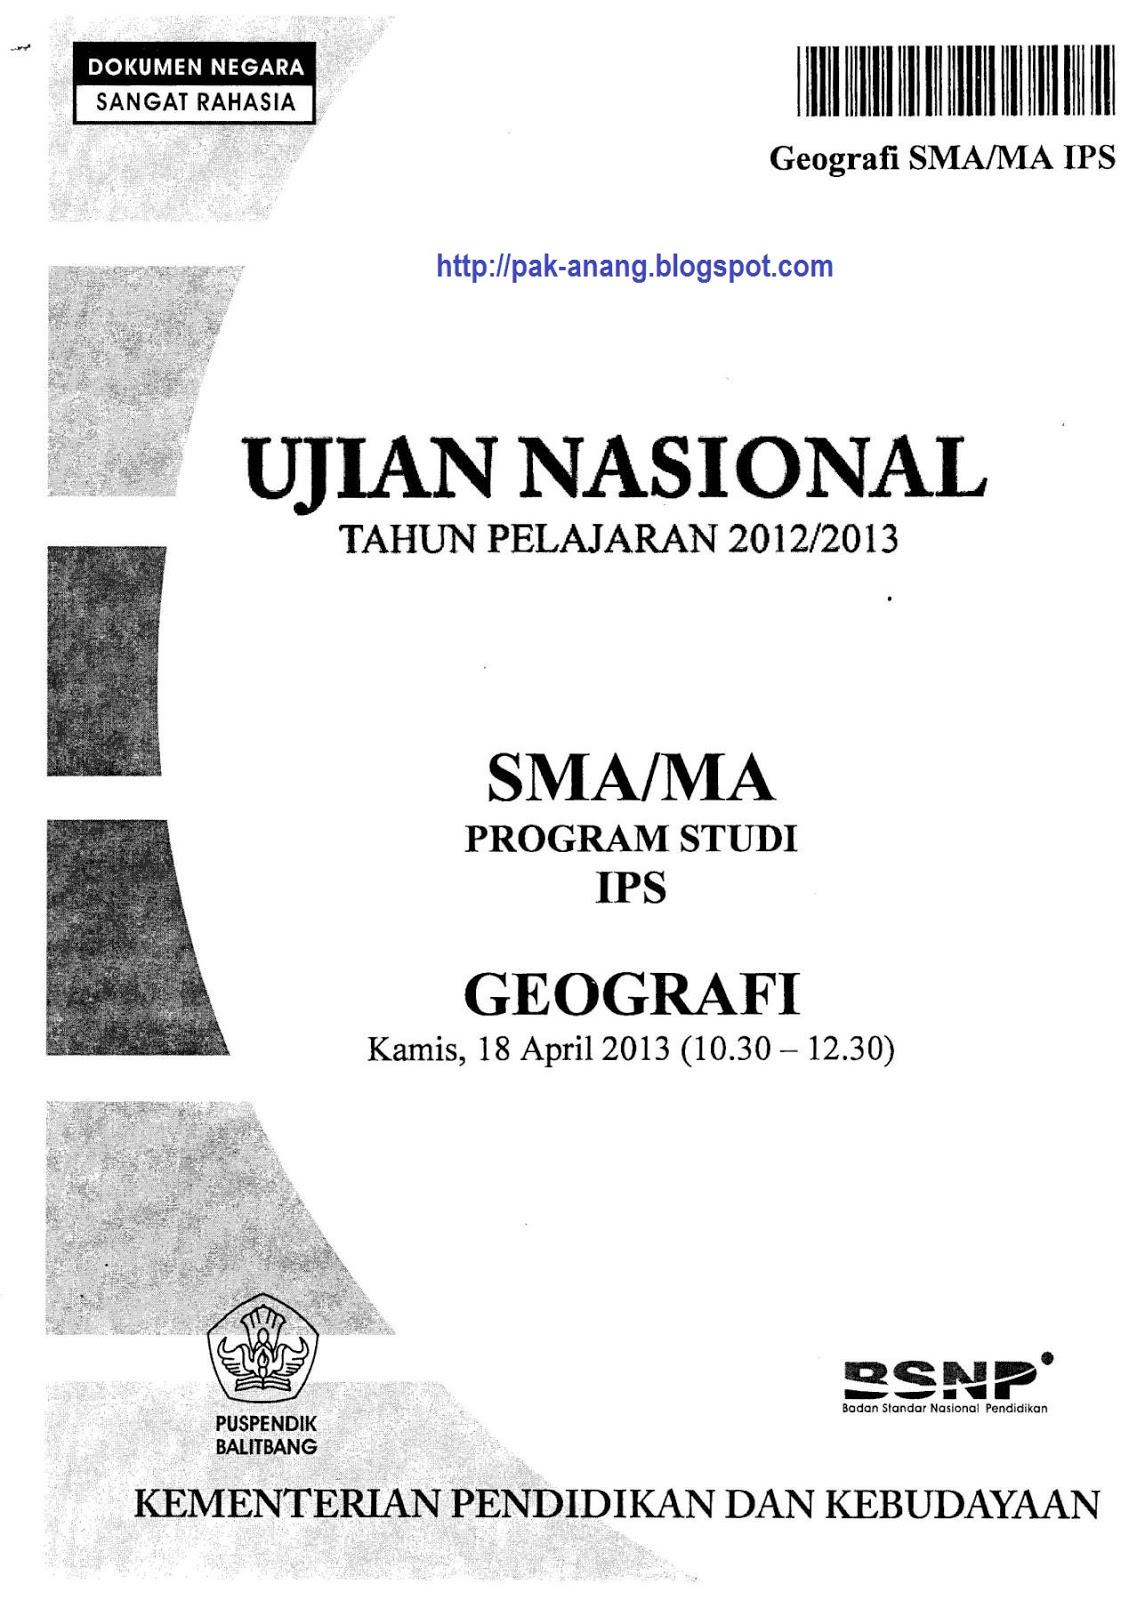 Materi Geografi Sma Kelas Xi Info Kampus Indonesia Share The Knownledge